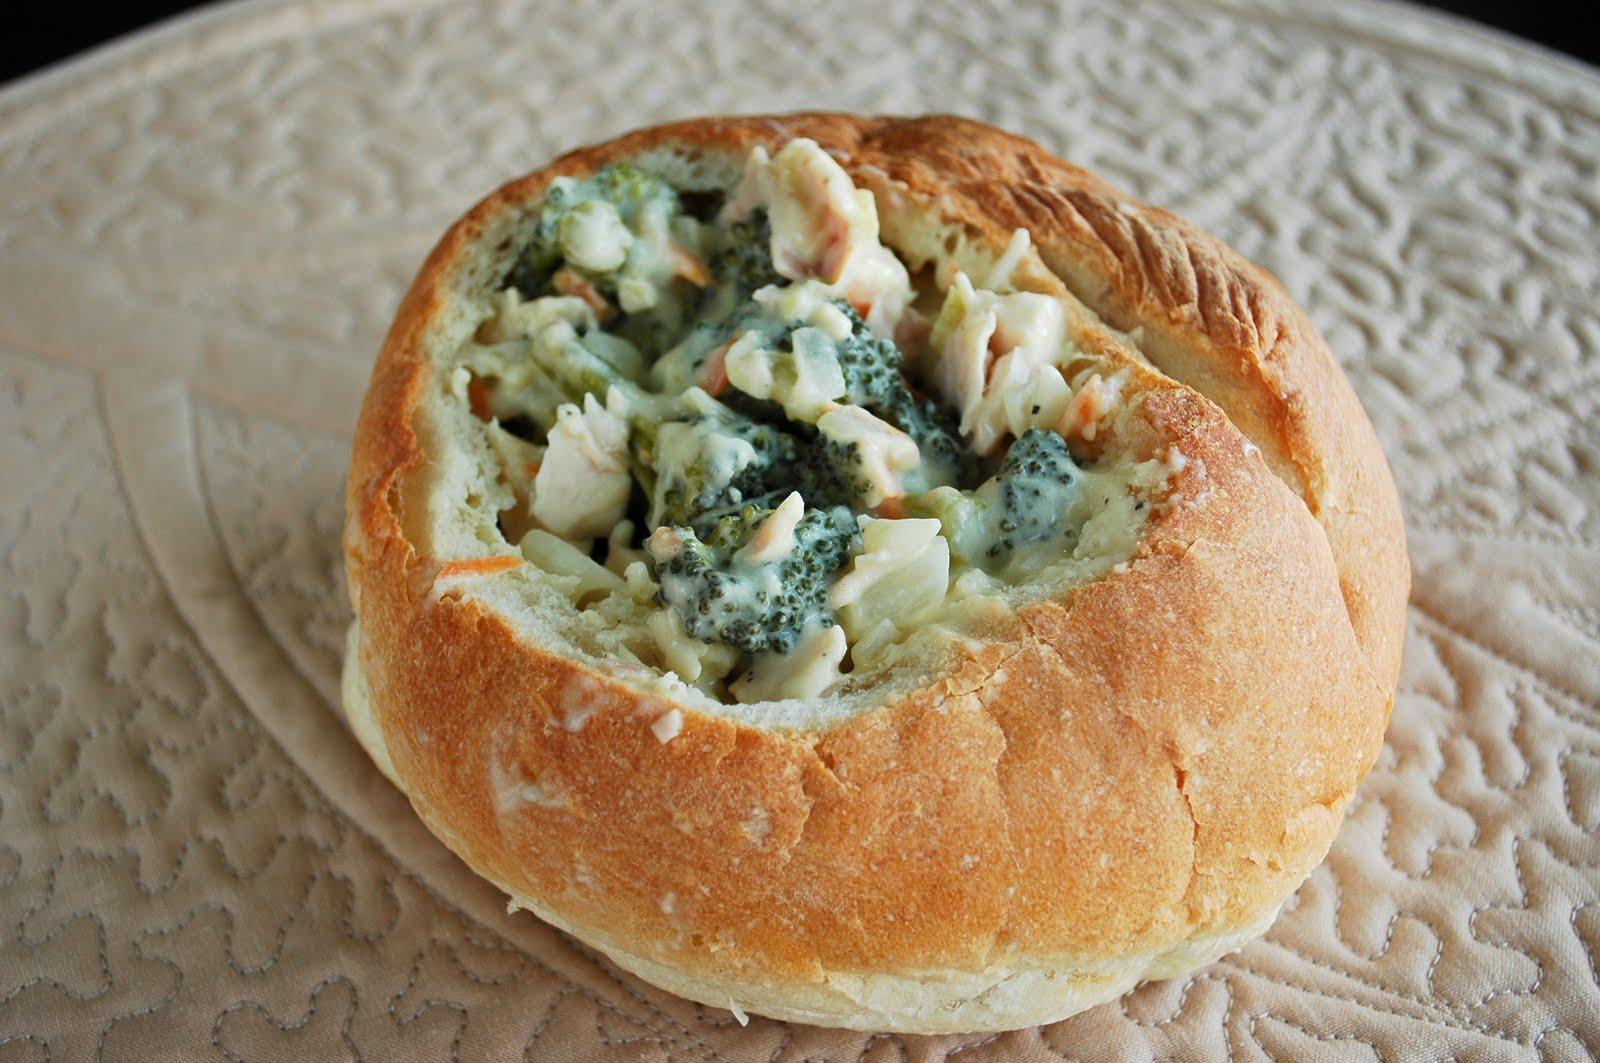 Good Thymes and Good Food: Chicken Cordon Bleu Sourdough Bread Bowls